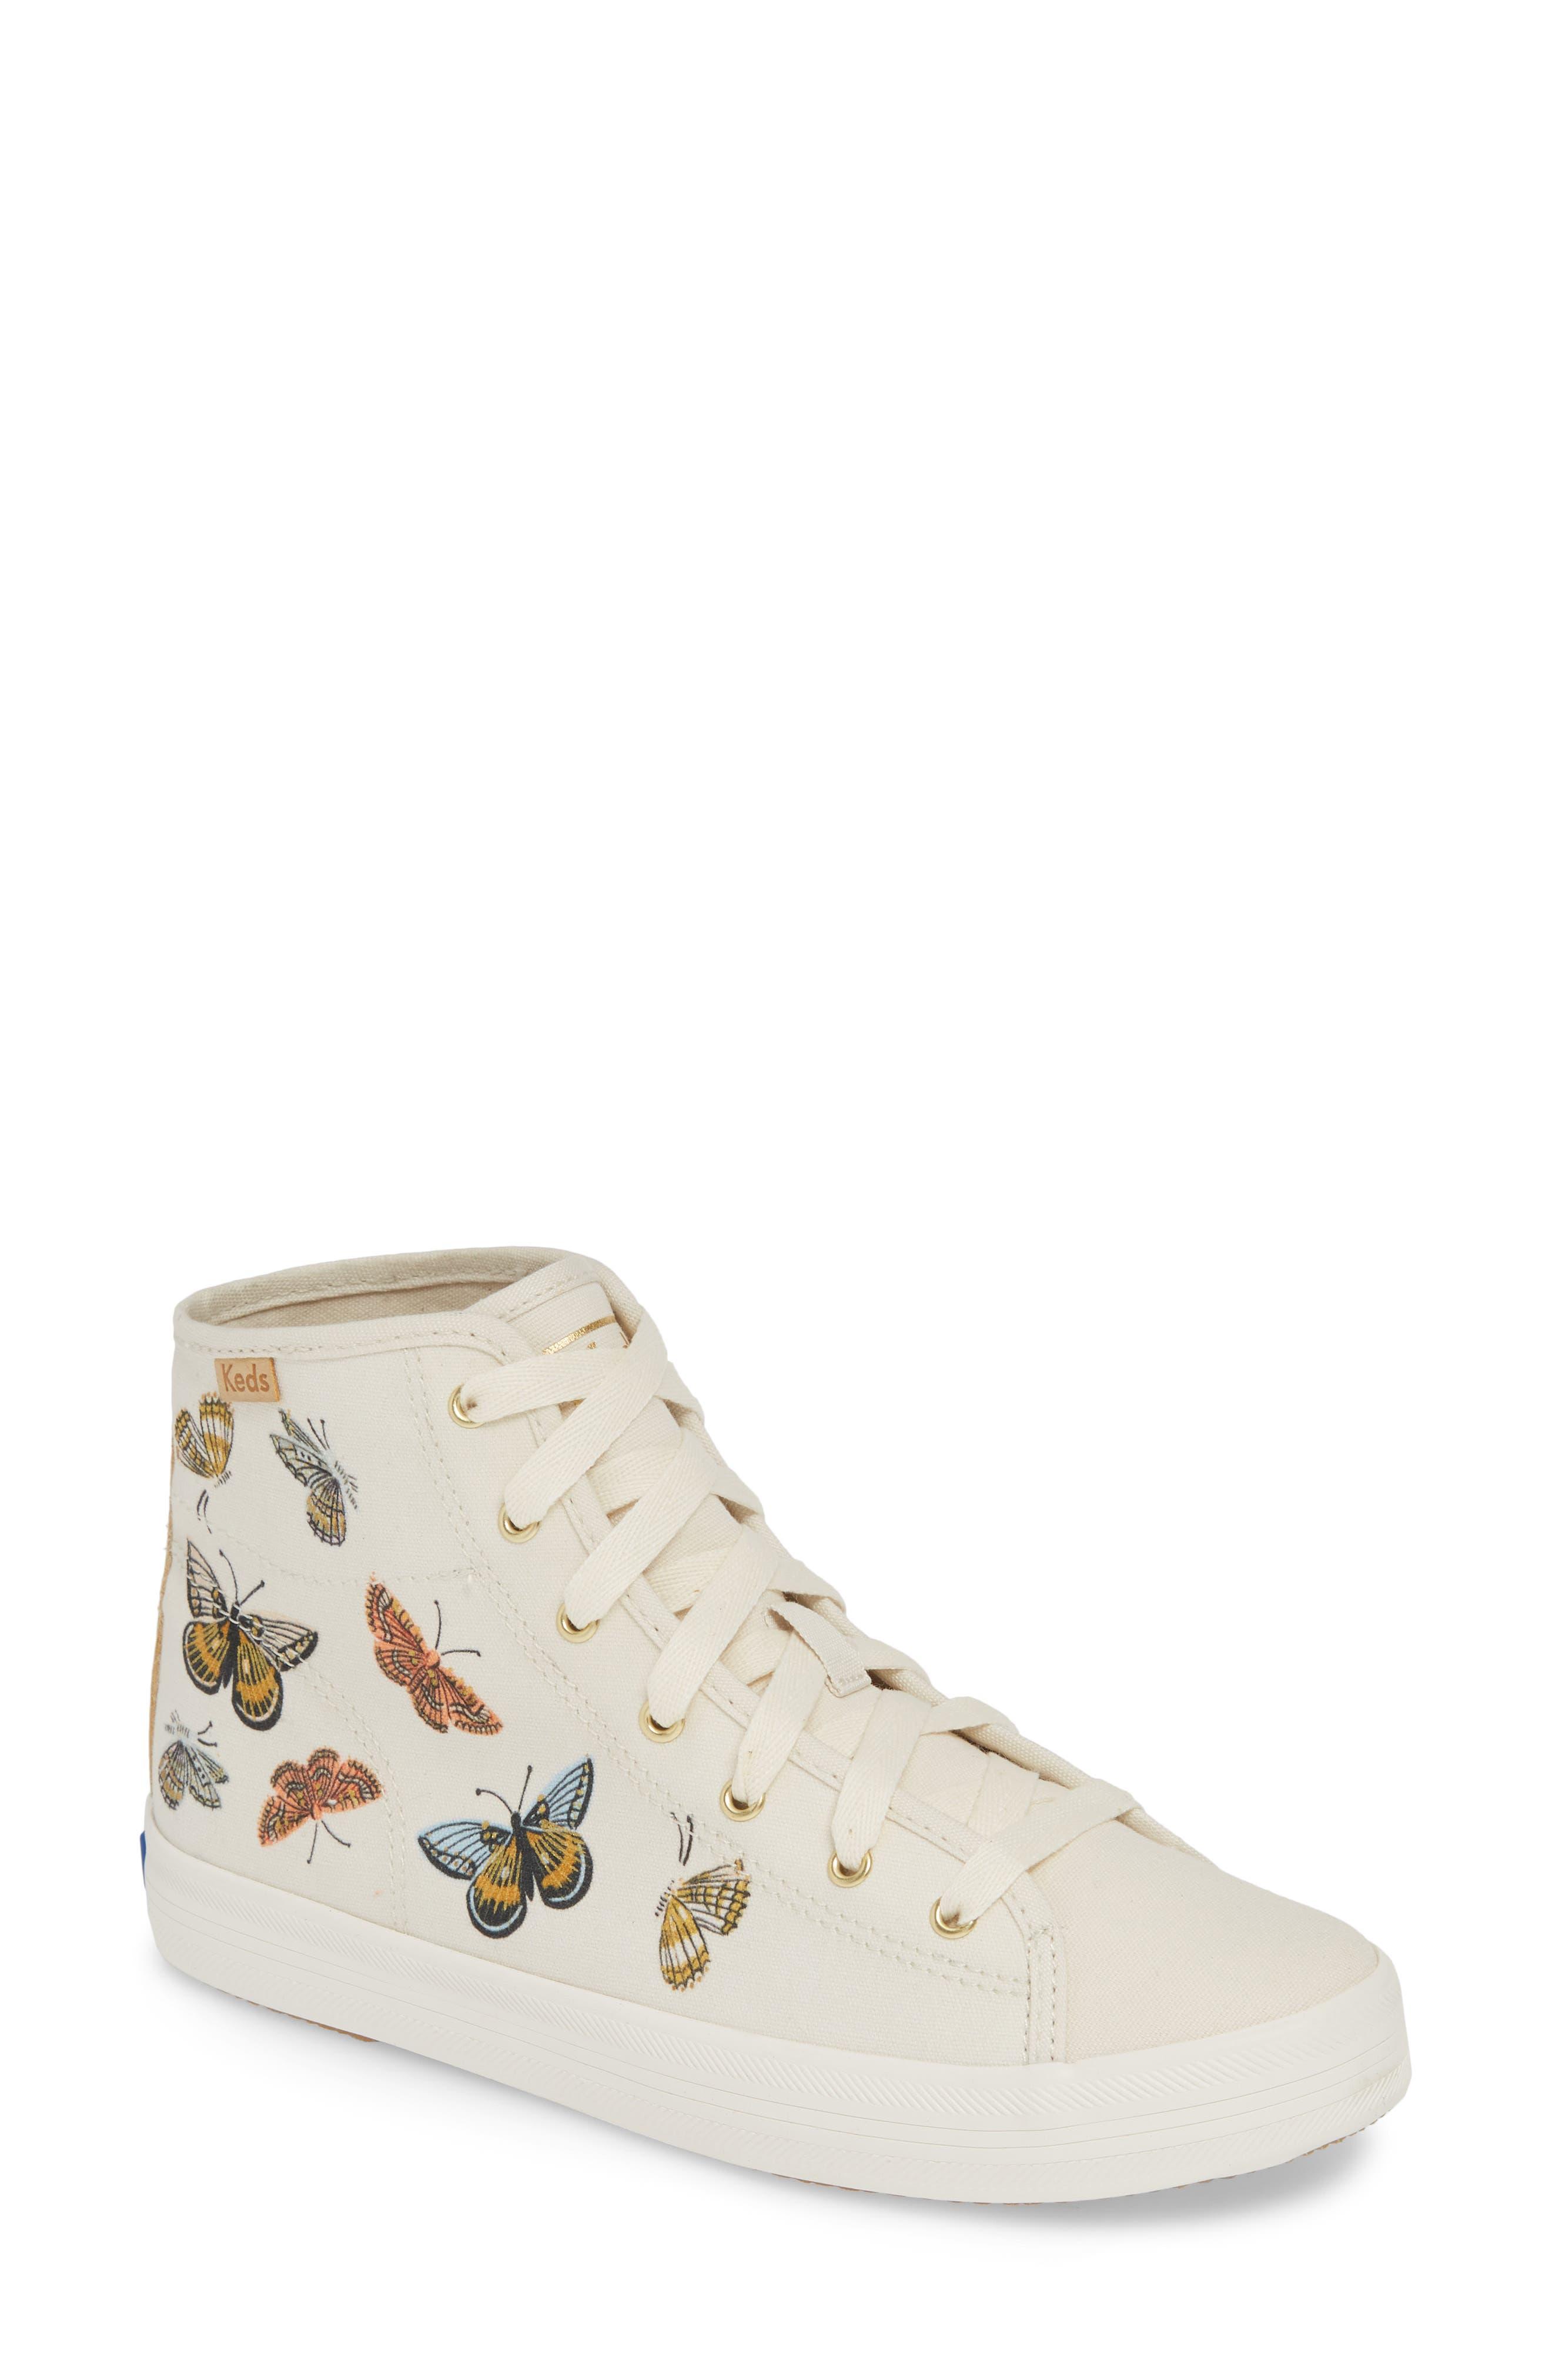 KEDS<SUP>®</SUP>, x Rifle Paper Co. Kickstart Butterfly Sneaker, Main thumbnail 1, color, CREAM